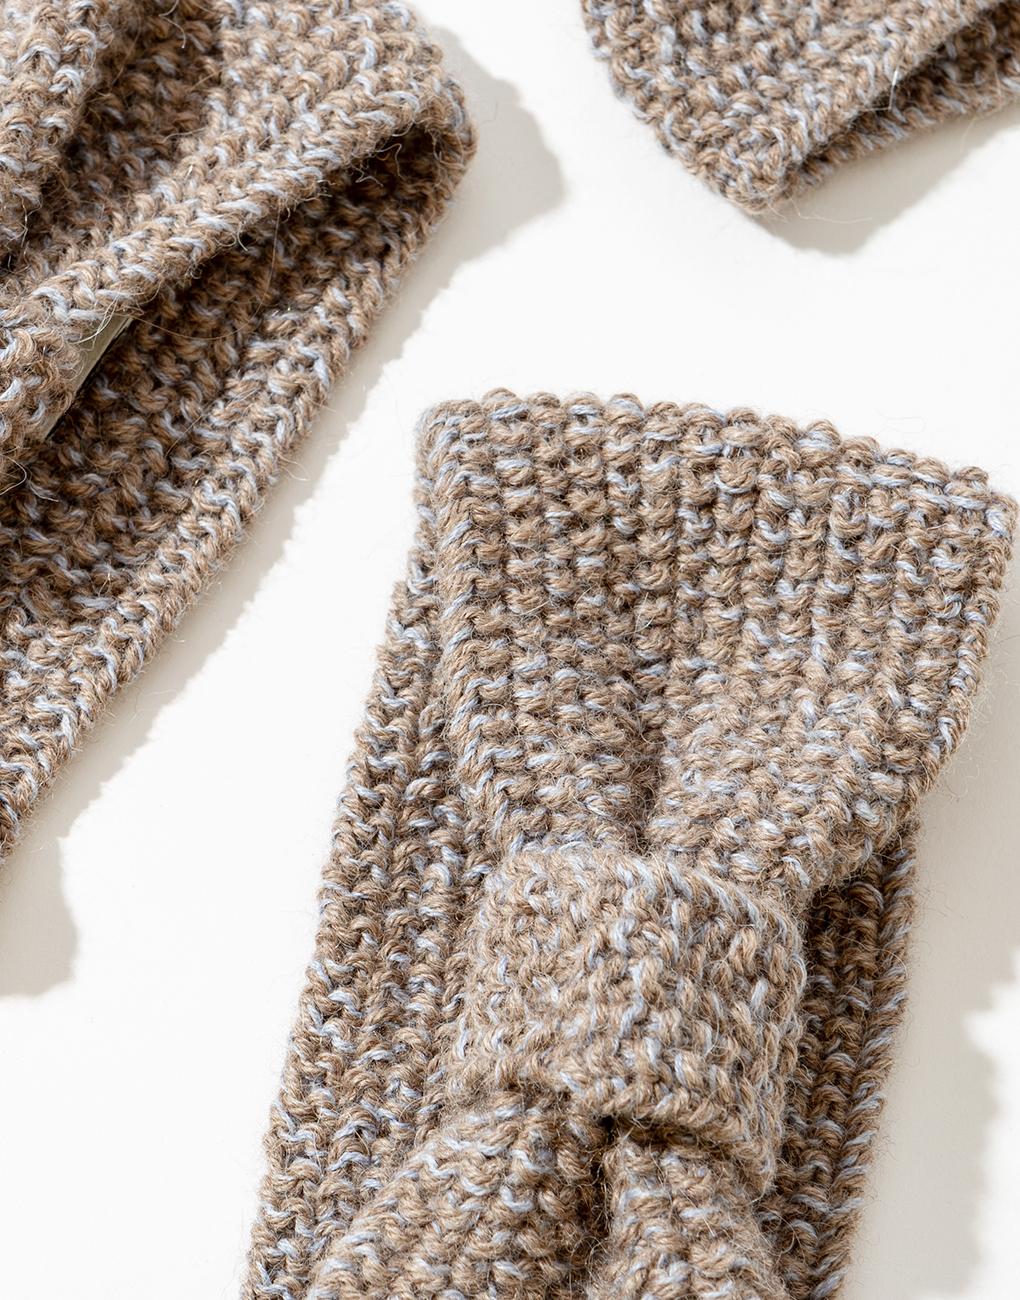 Knitted-Baby-Headband-Gray-2-{The-Little-Market}.jpg